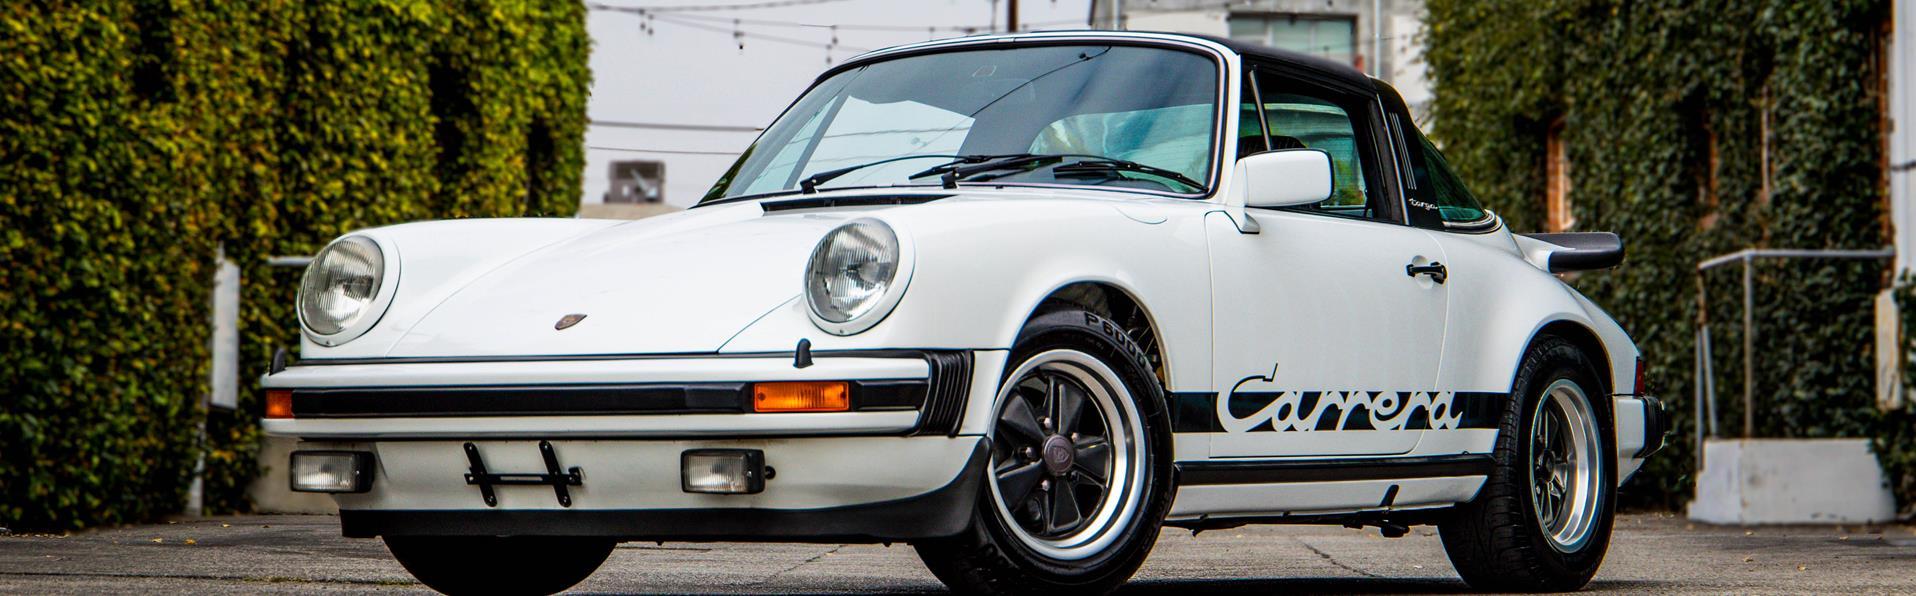 Classic Sports Cars Marina Del Rey CA | Exotic & Collectible Cars ...